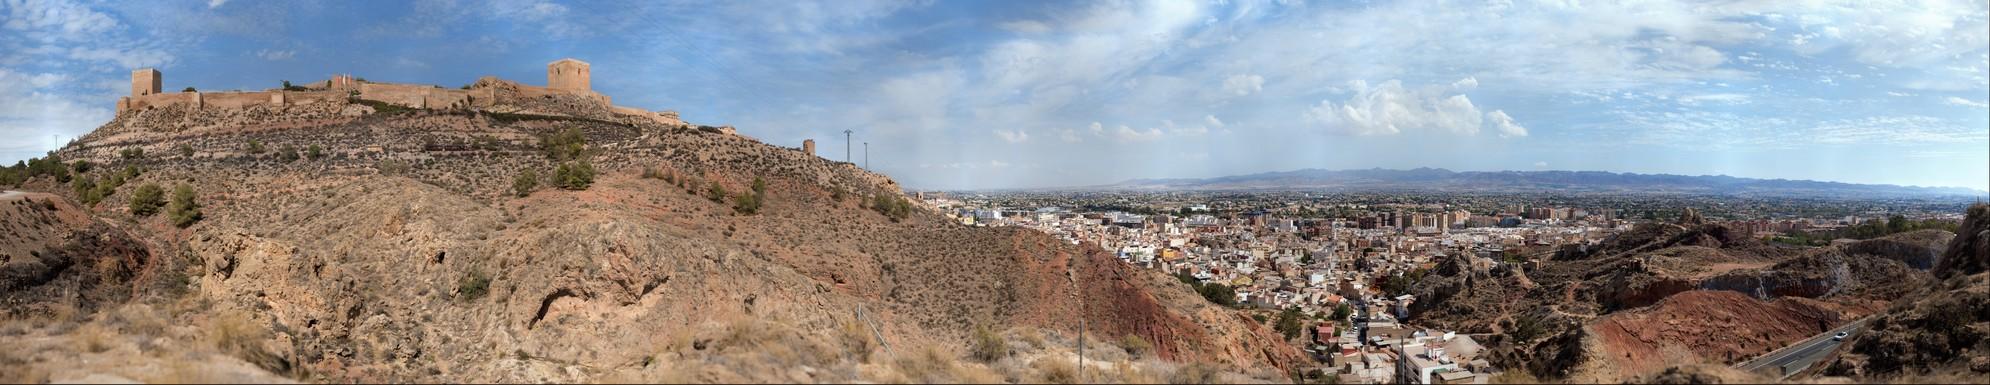 "Spain - Lorca ""Fortress of the Sun"""